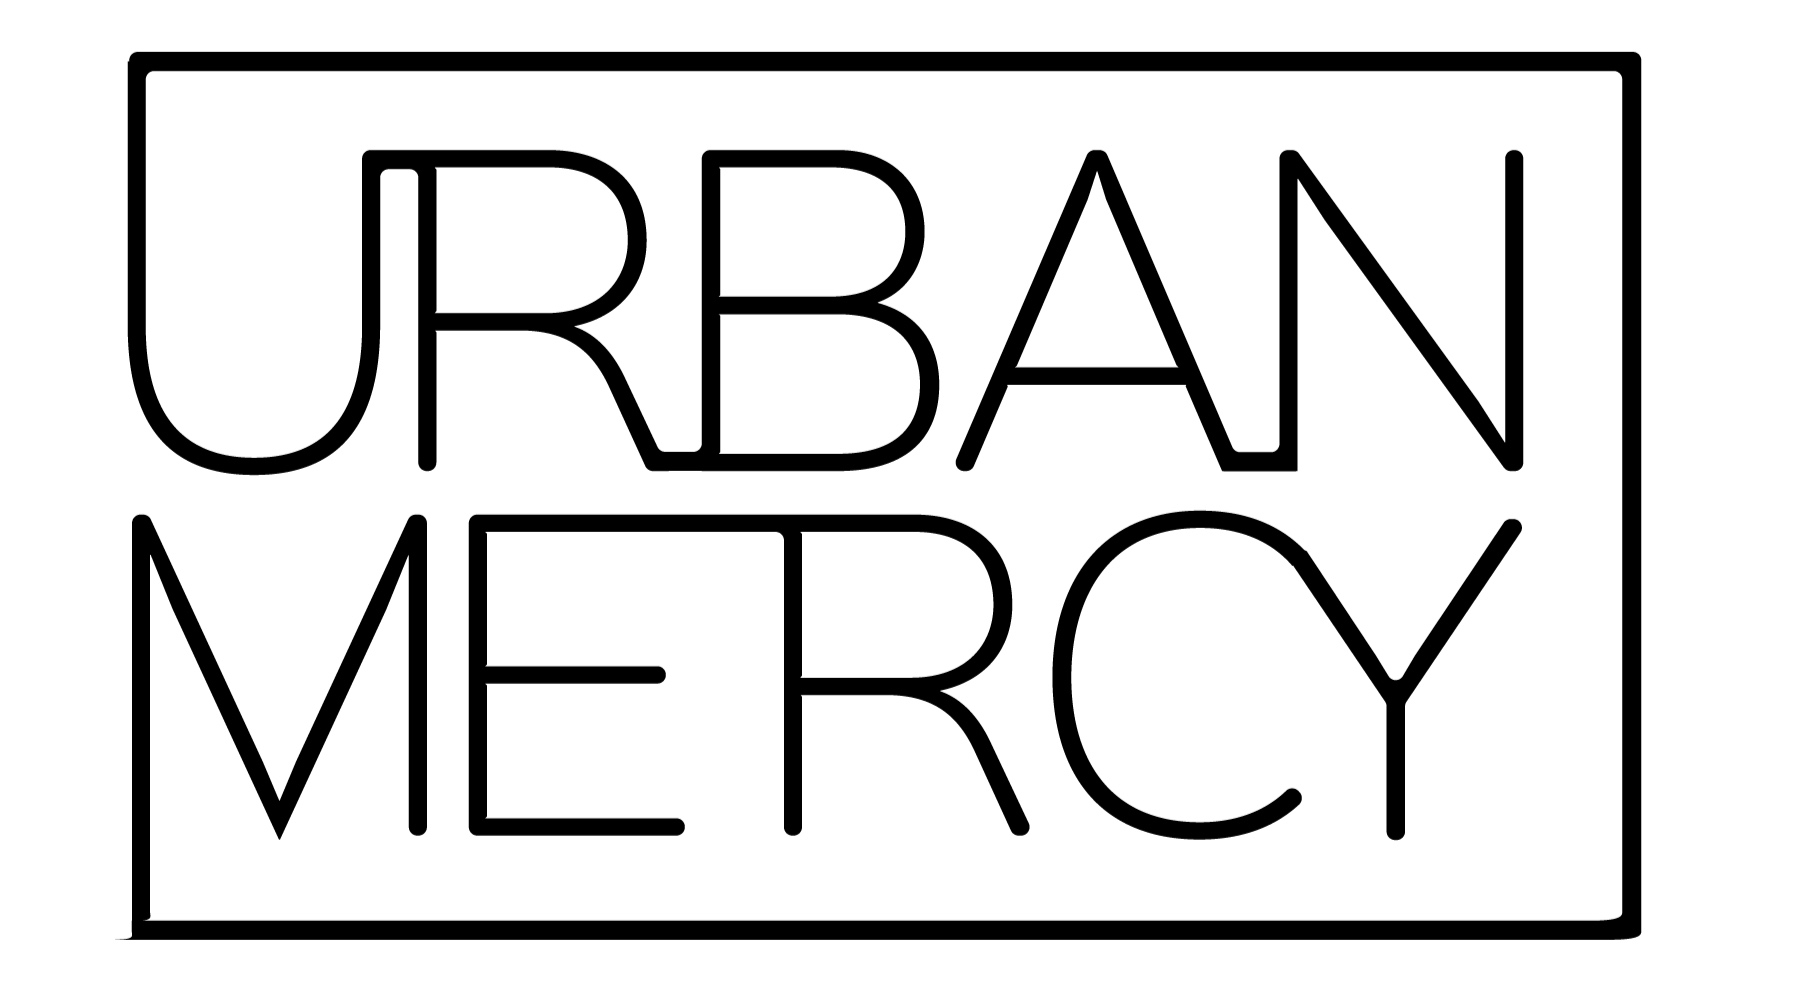 UrbanMercy-blk.jpg